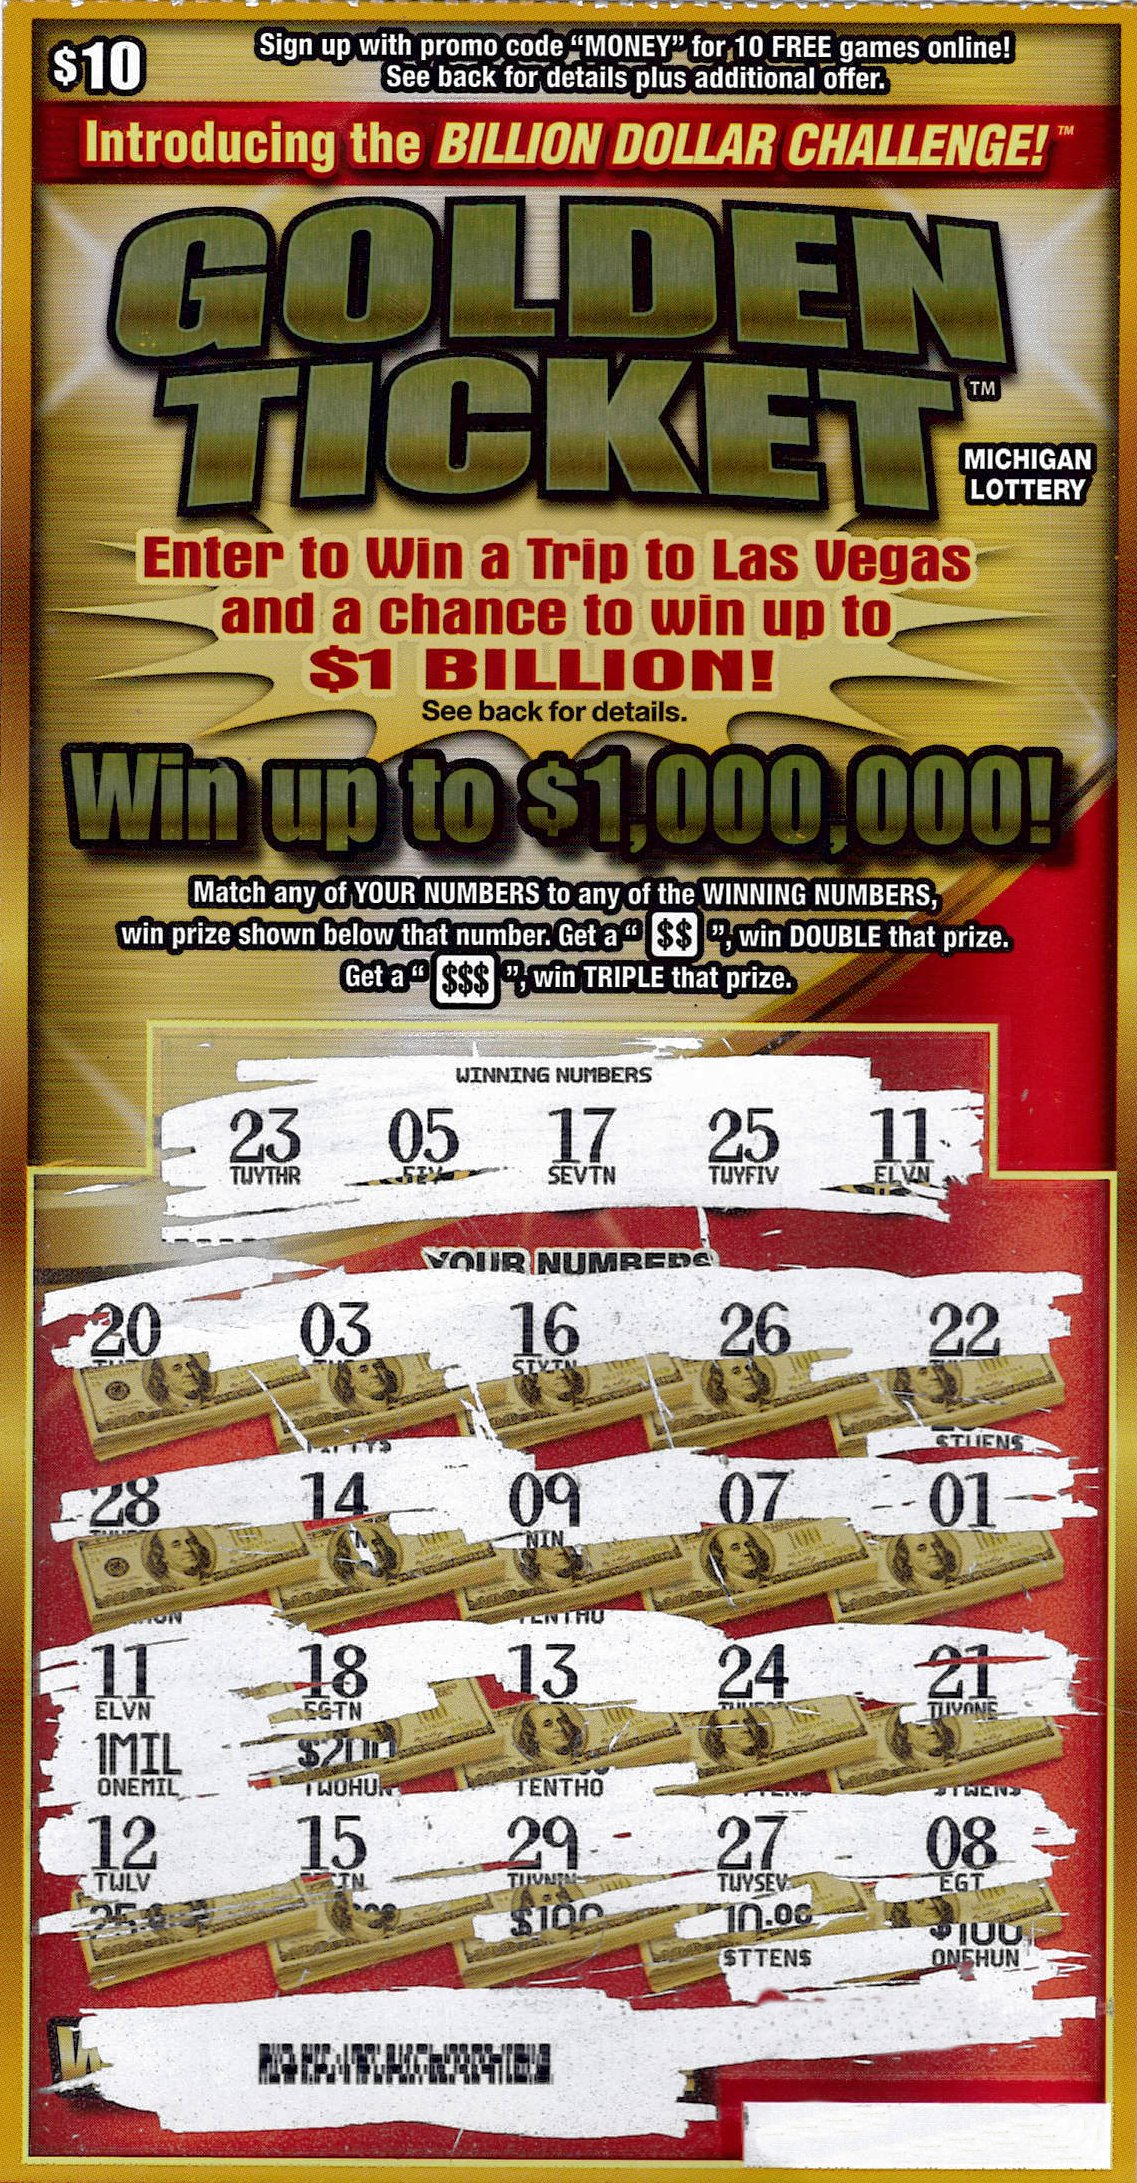 Mecosta County Woman Wins $1 Million Playing the Michigan Lottery's